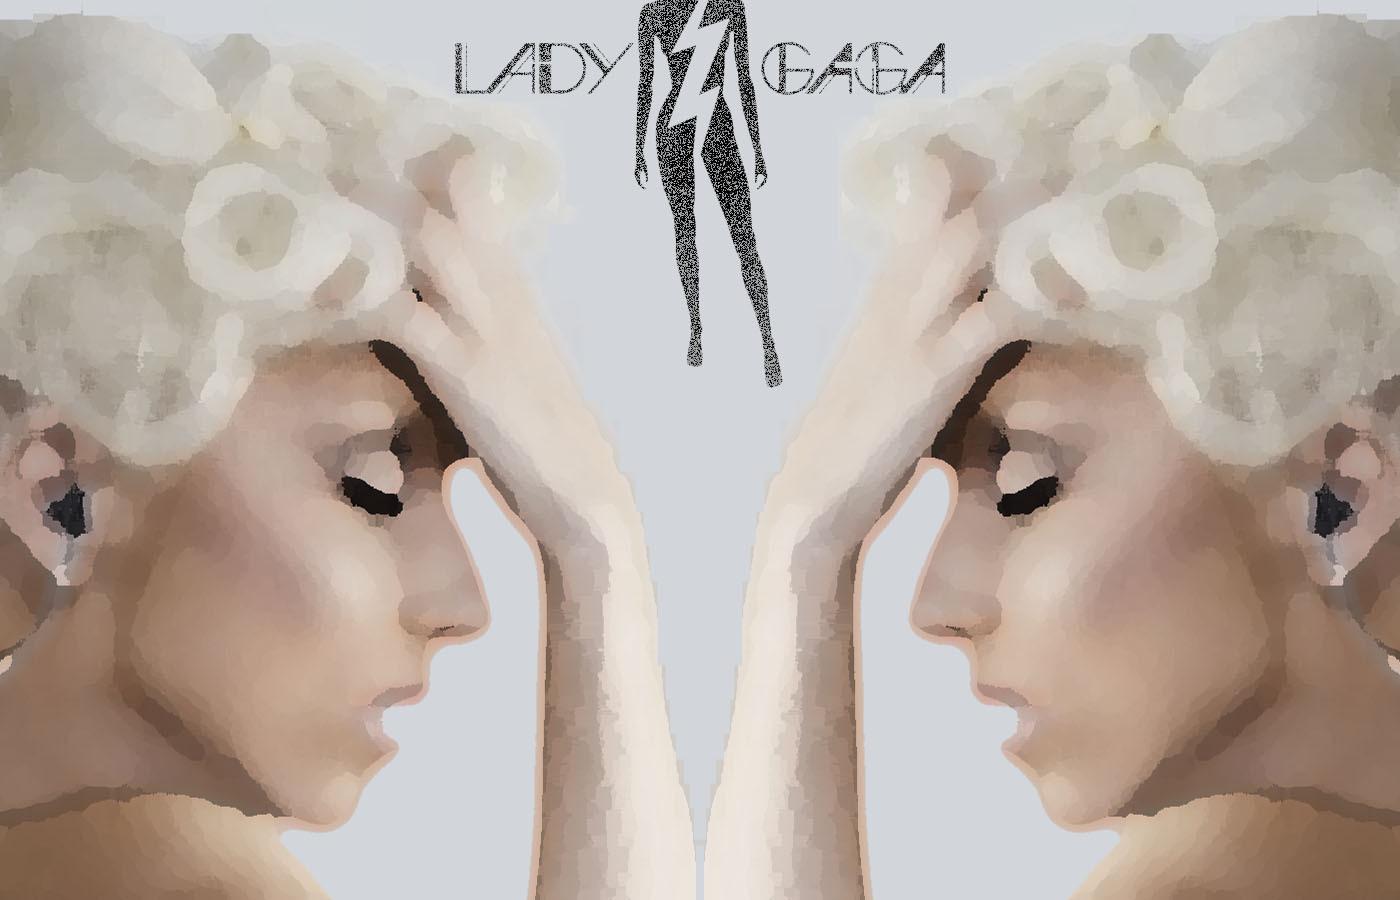 Bad Romance Water - Lady Gaga Photo (9230234) - Fanpop